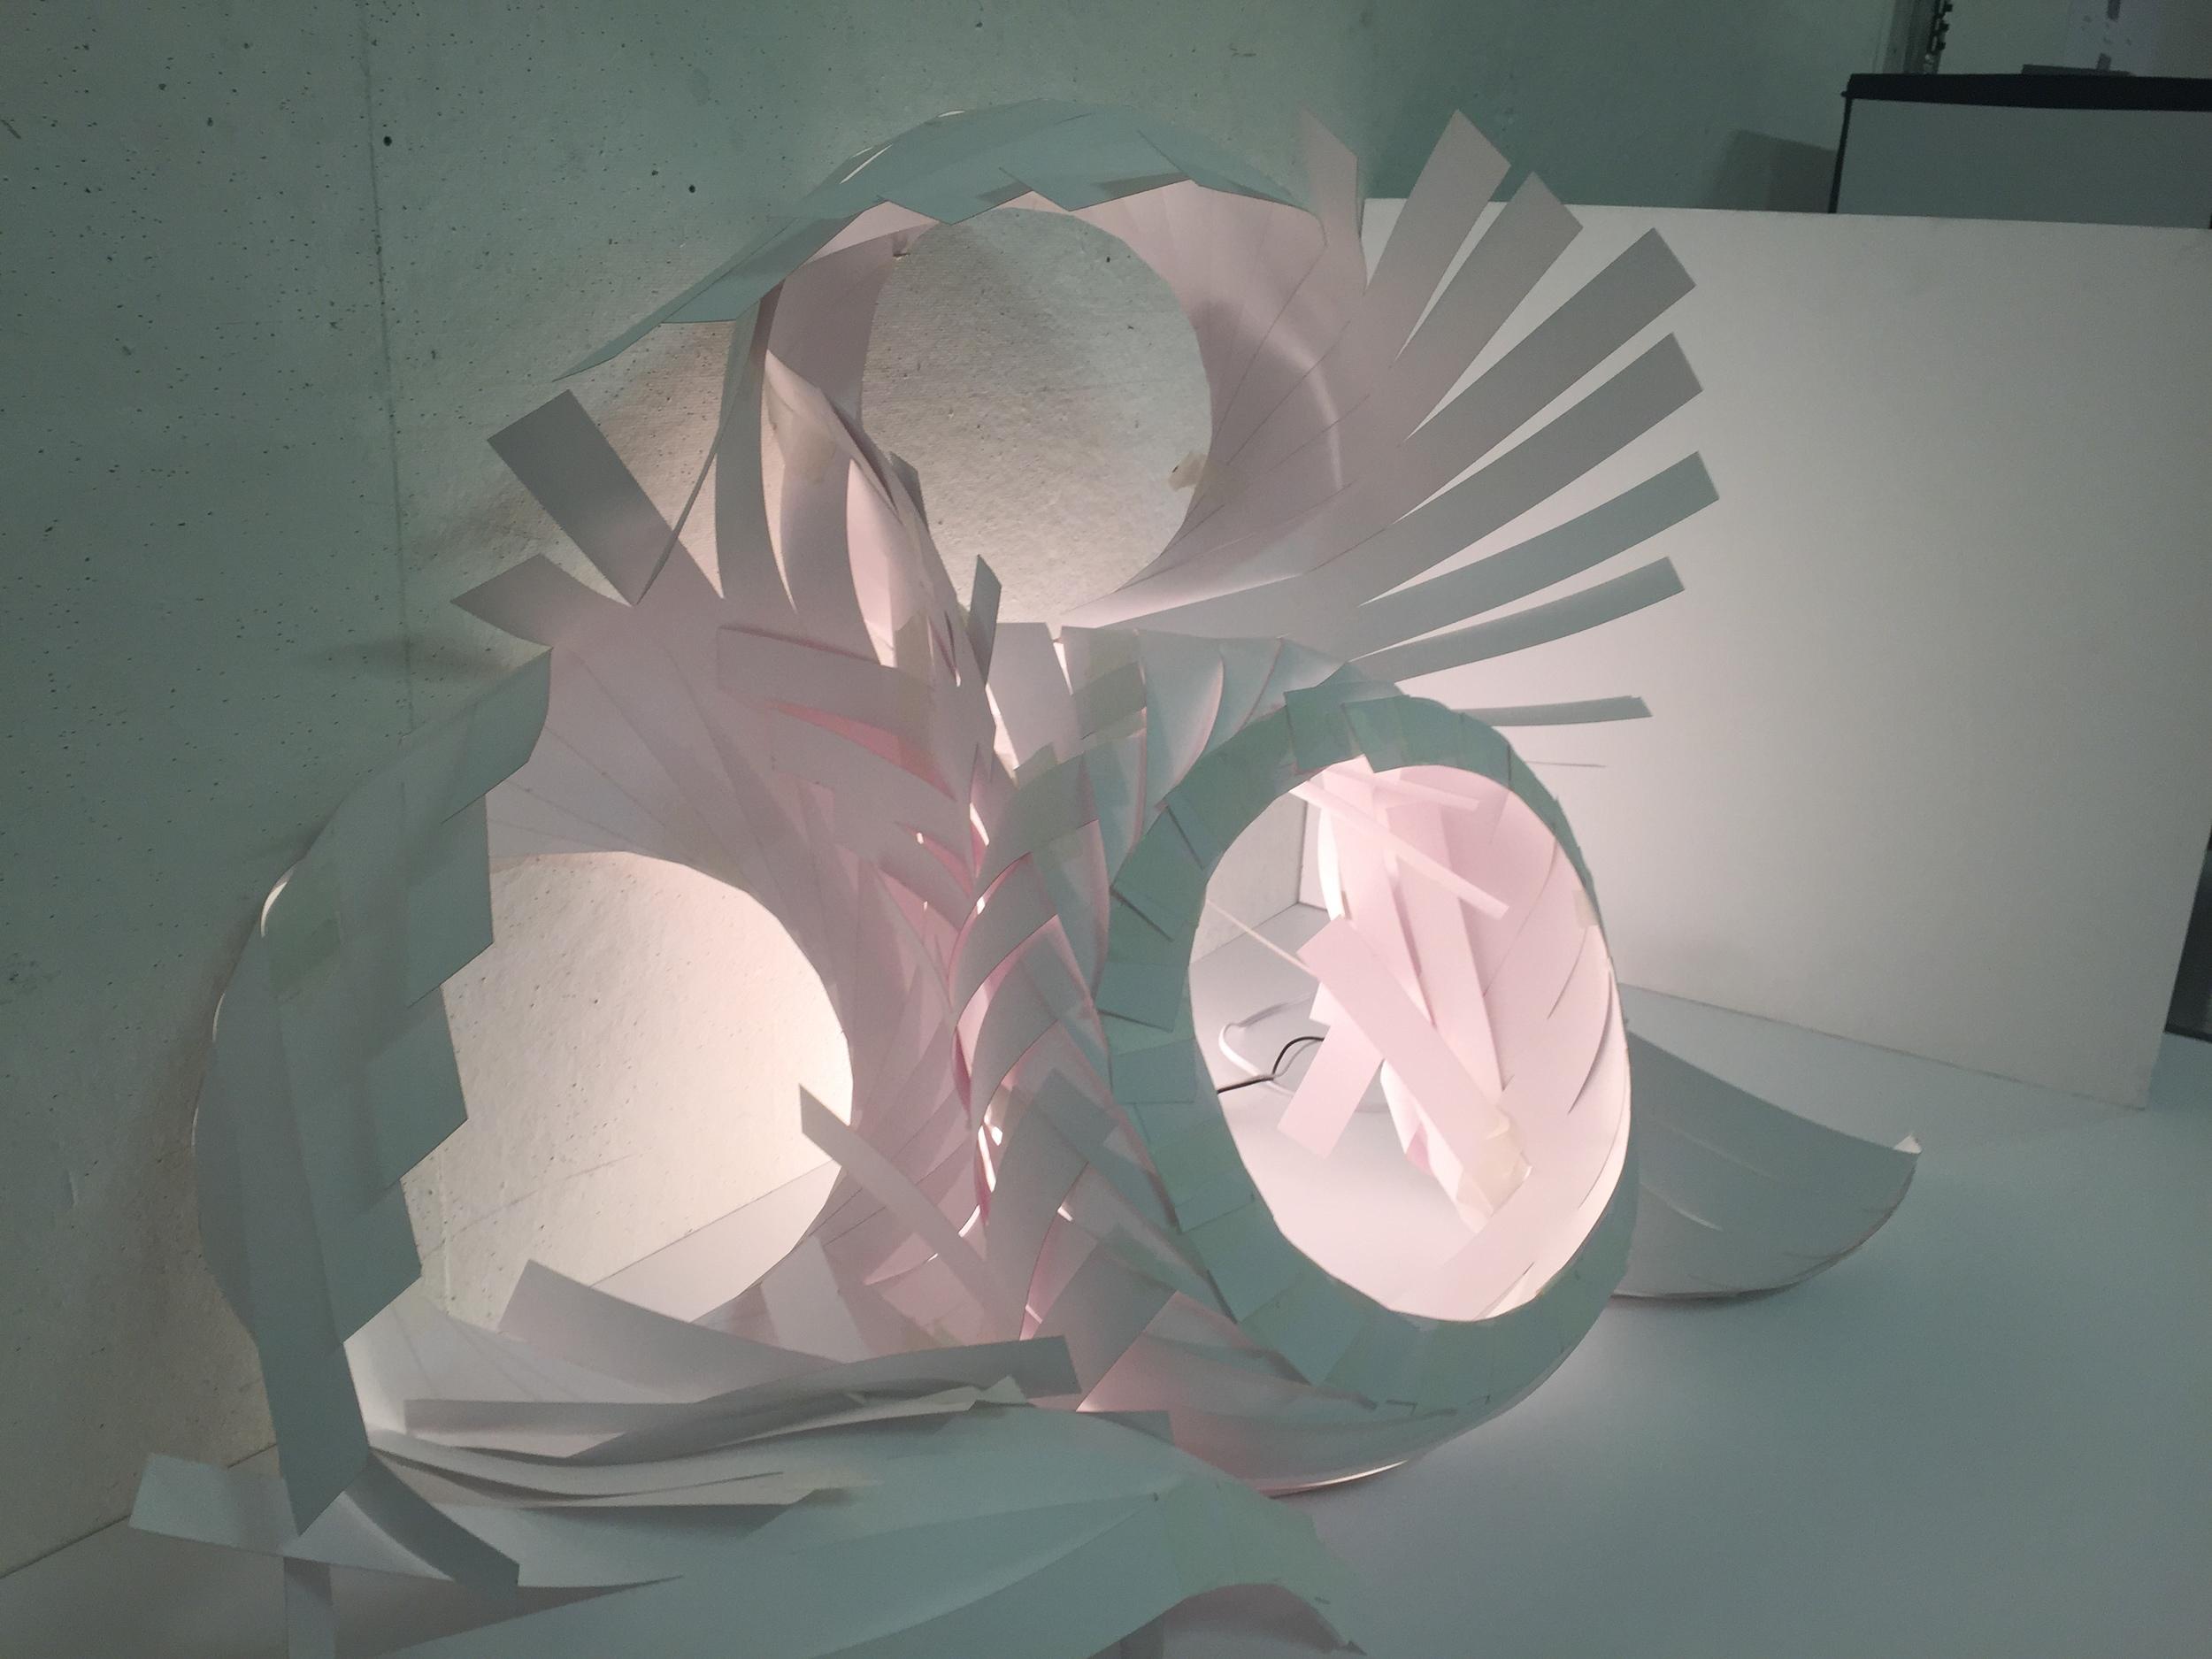 prototype made of bristol paper